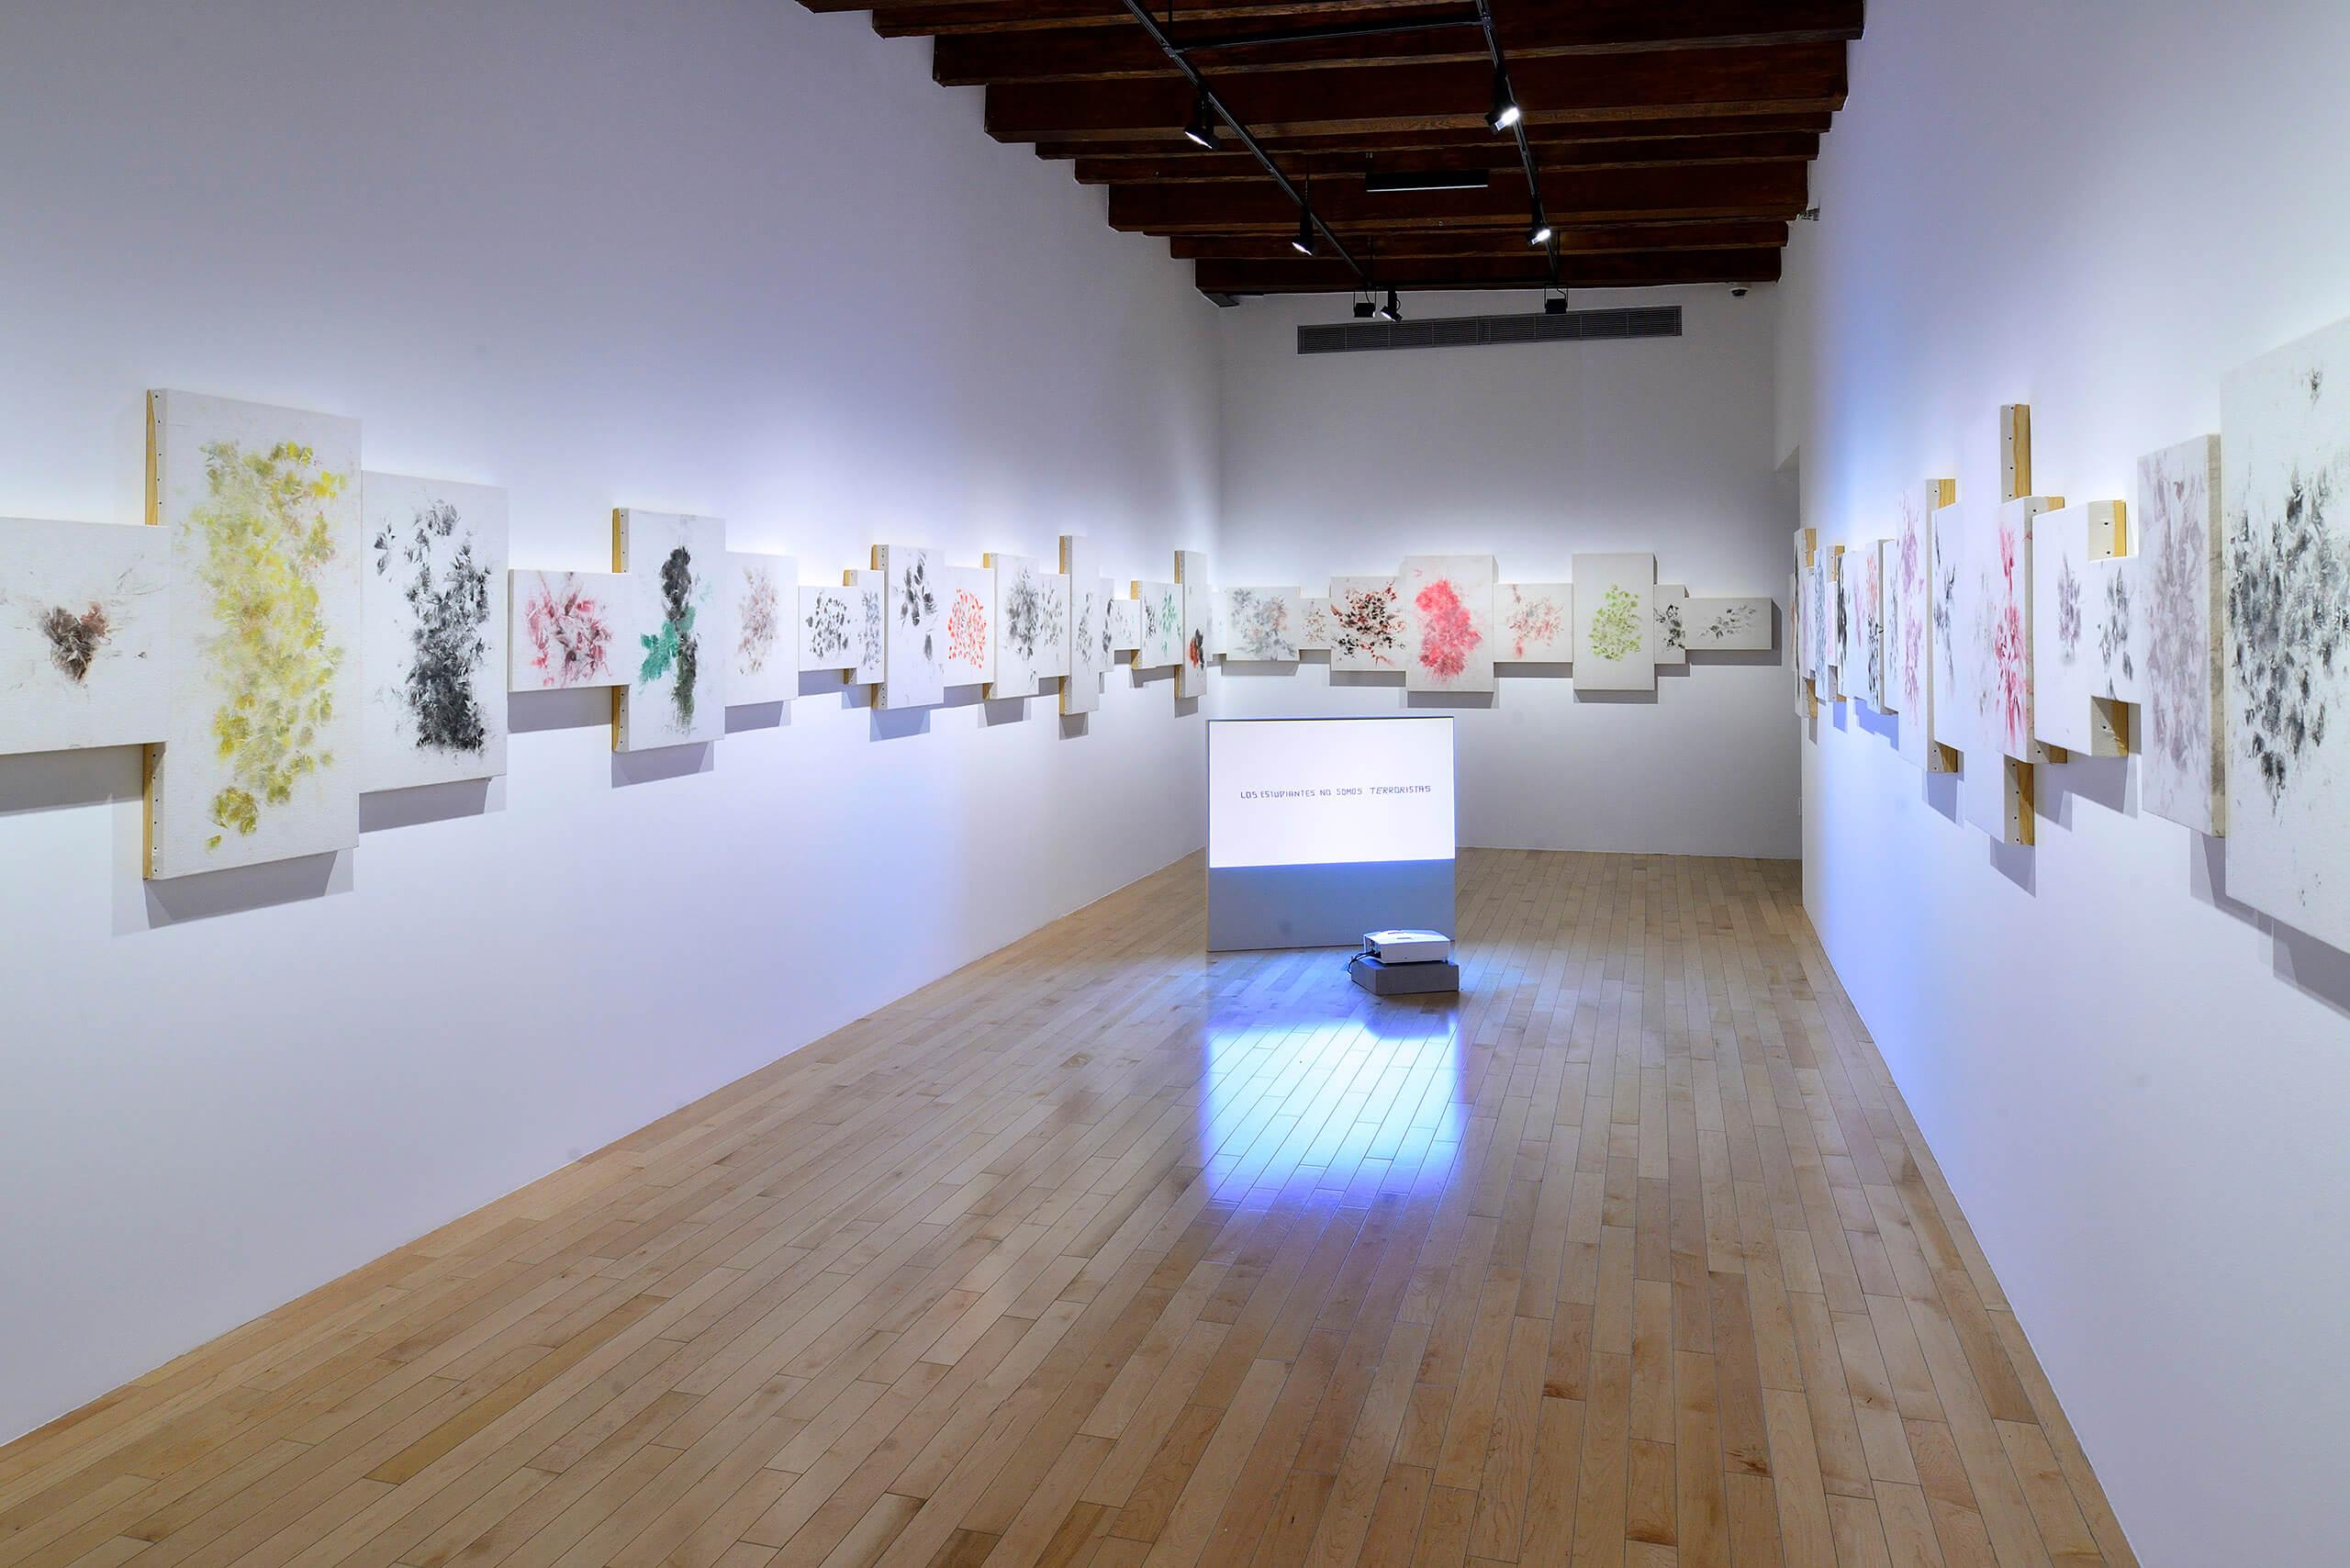 Paños | Tercerunquinto. Obra inconclusa | Museo Amparo, Puebla